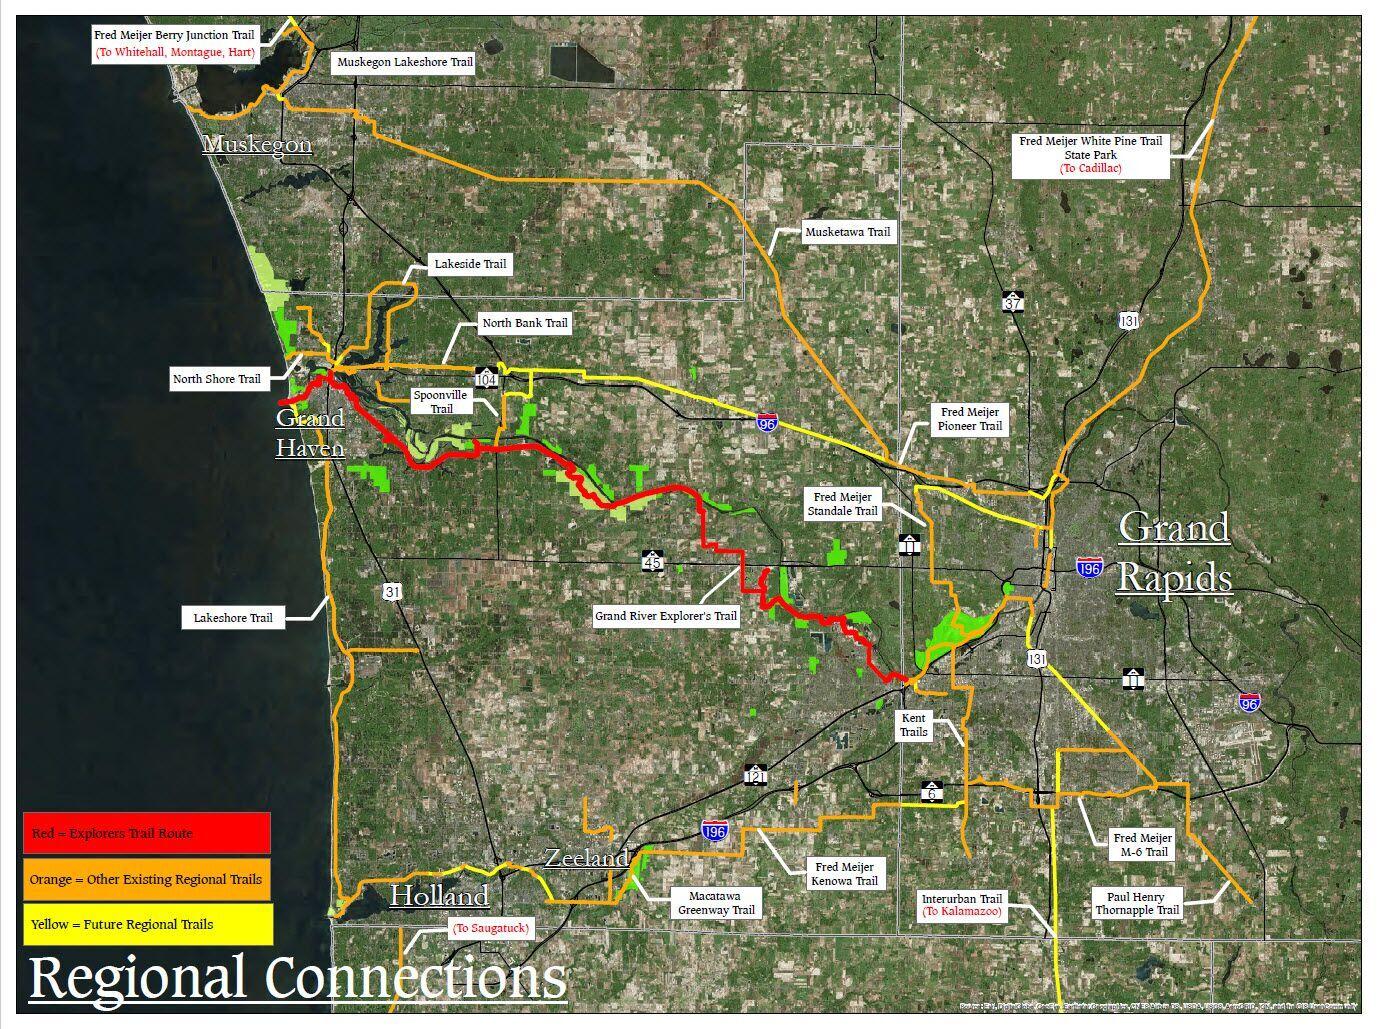 Gvsu Campus Map 2016.Greenway Park Projects Ottawa County Michigan